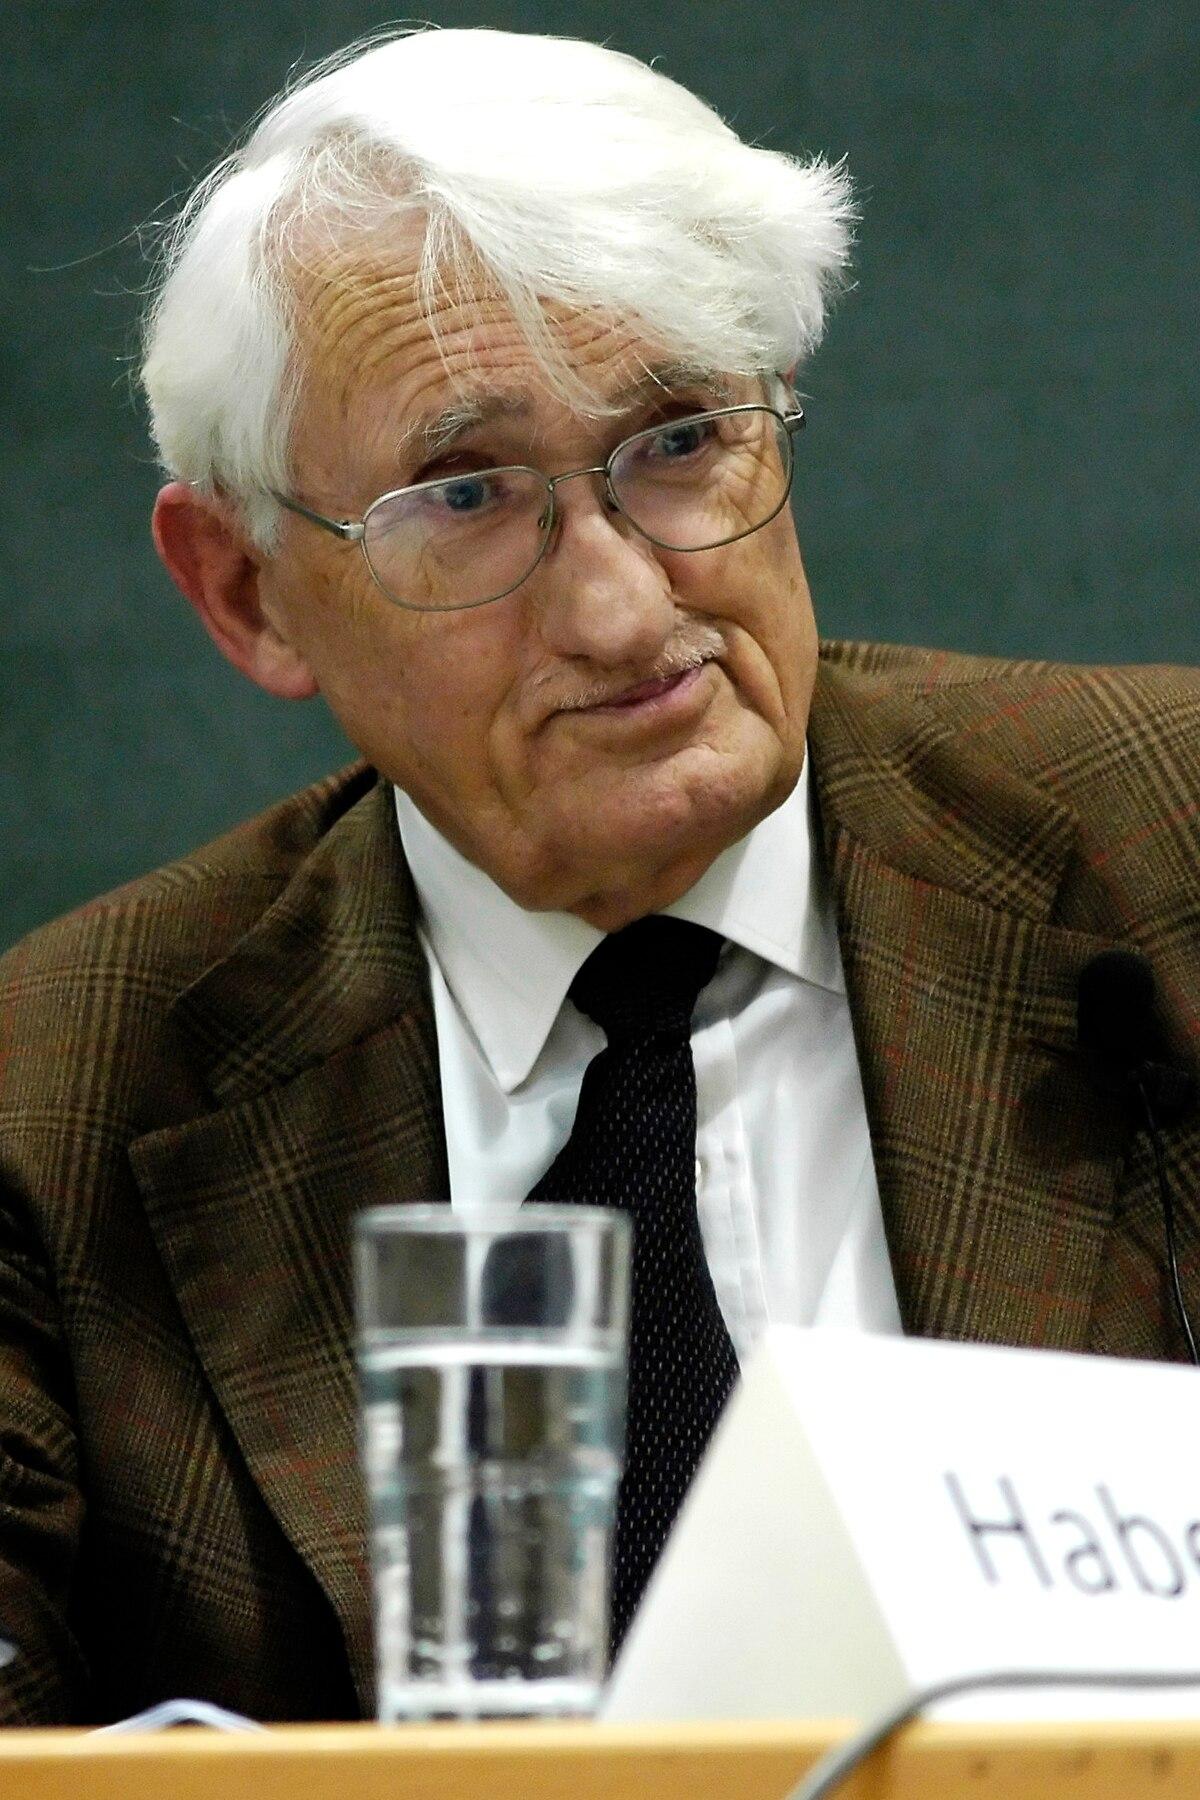 Jürgen habermas: we are stuck in a political trap